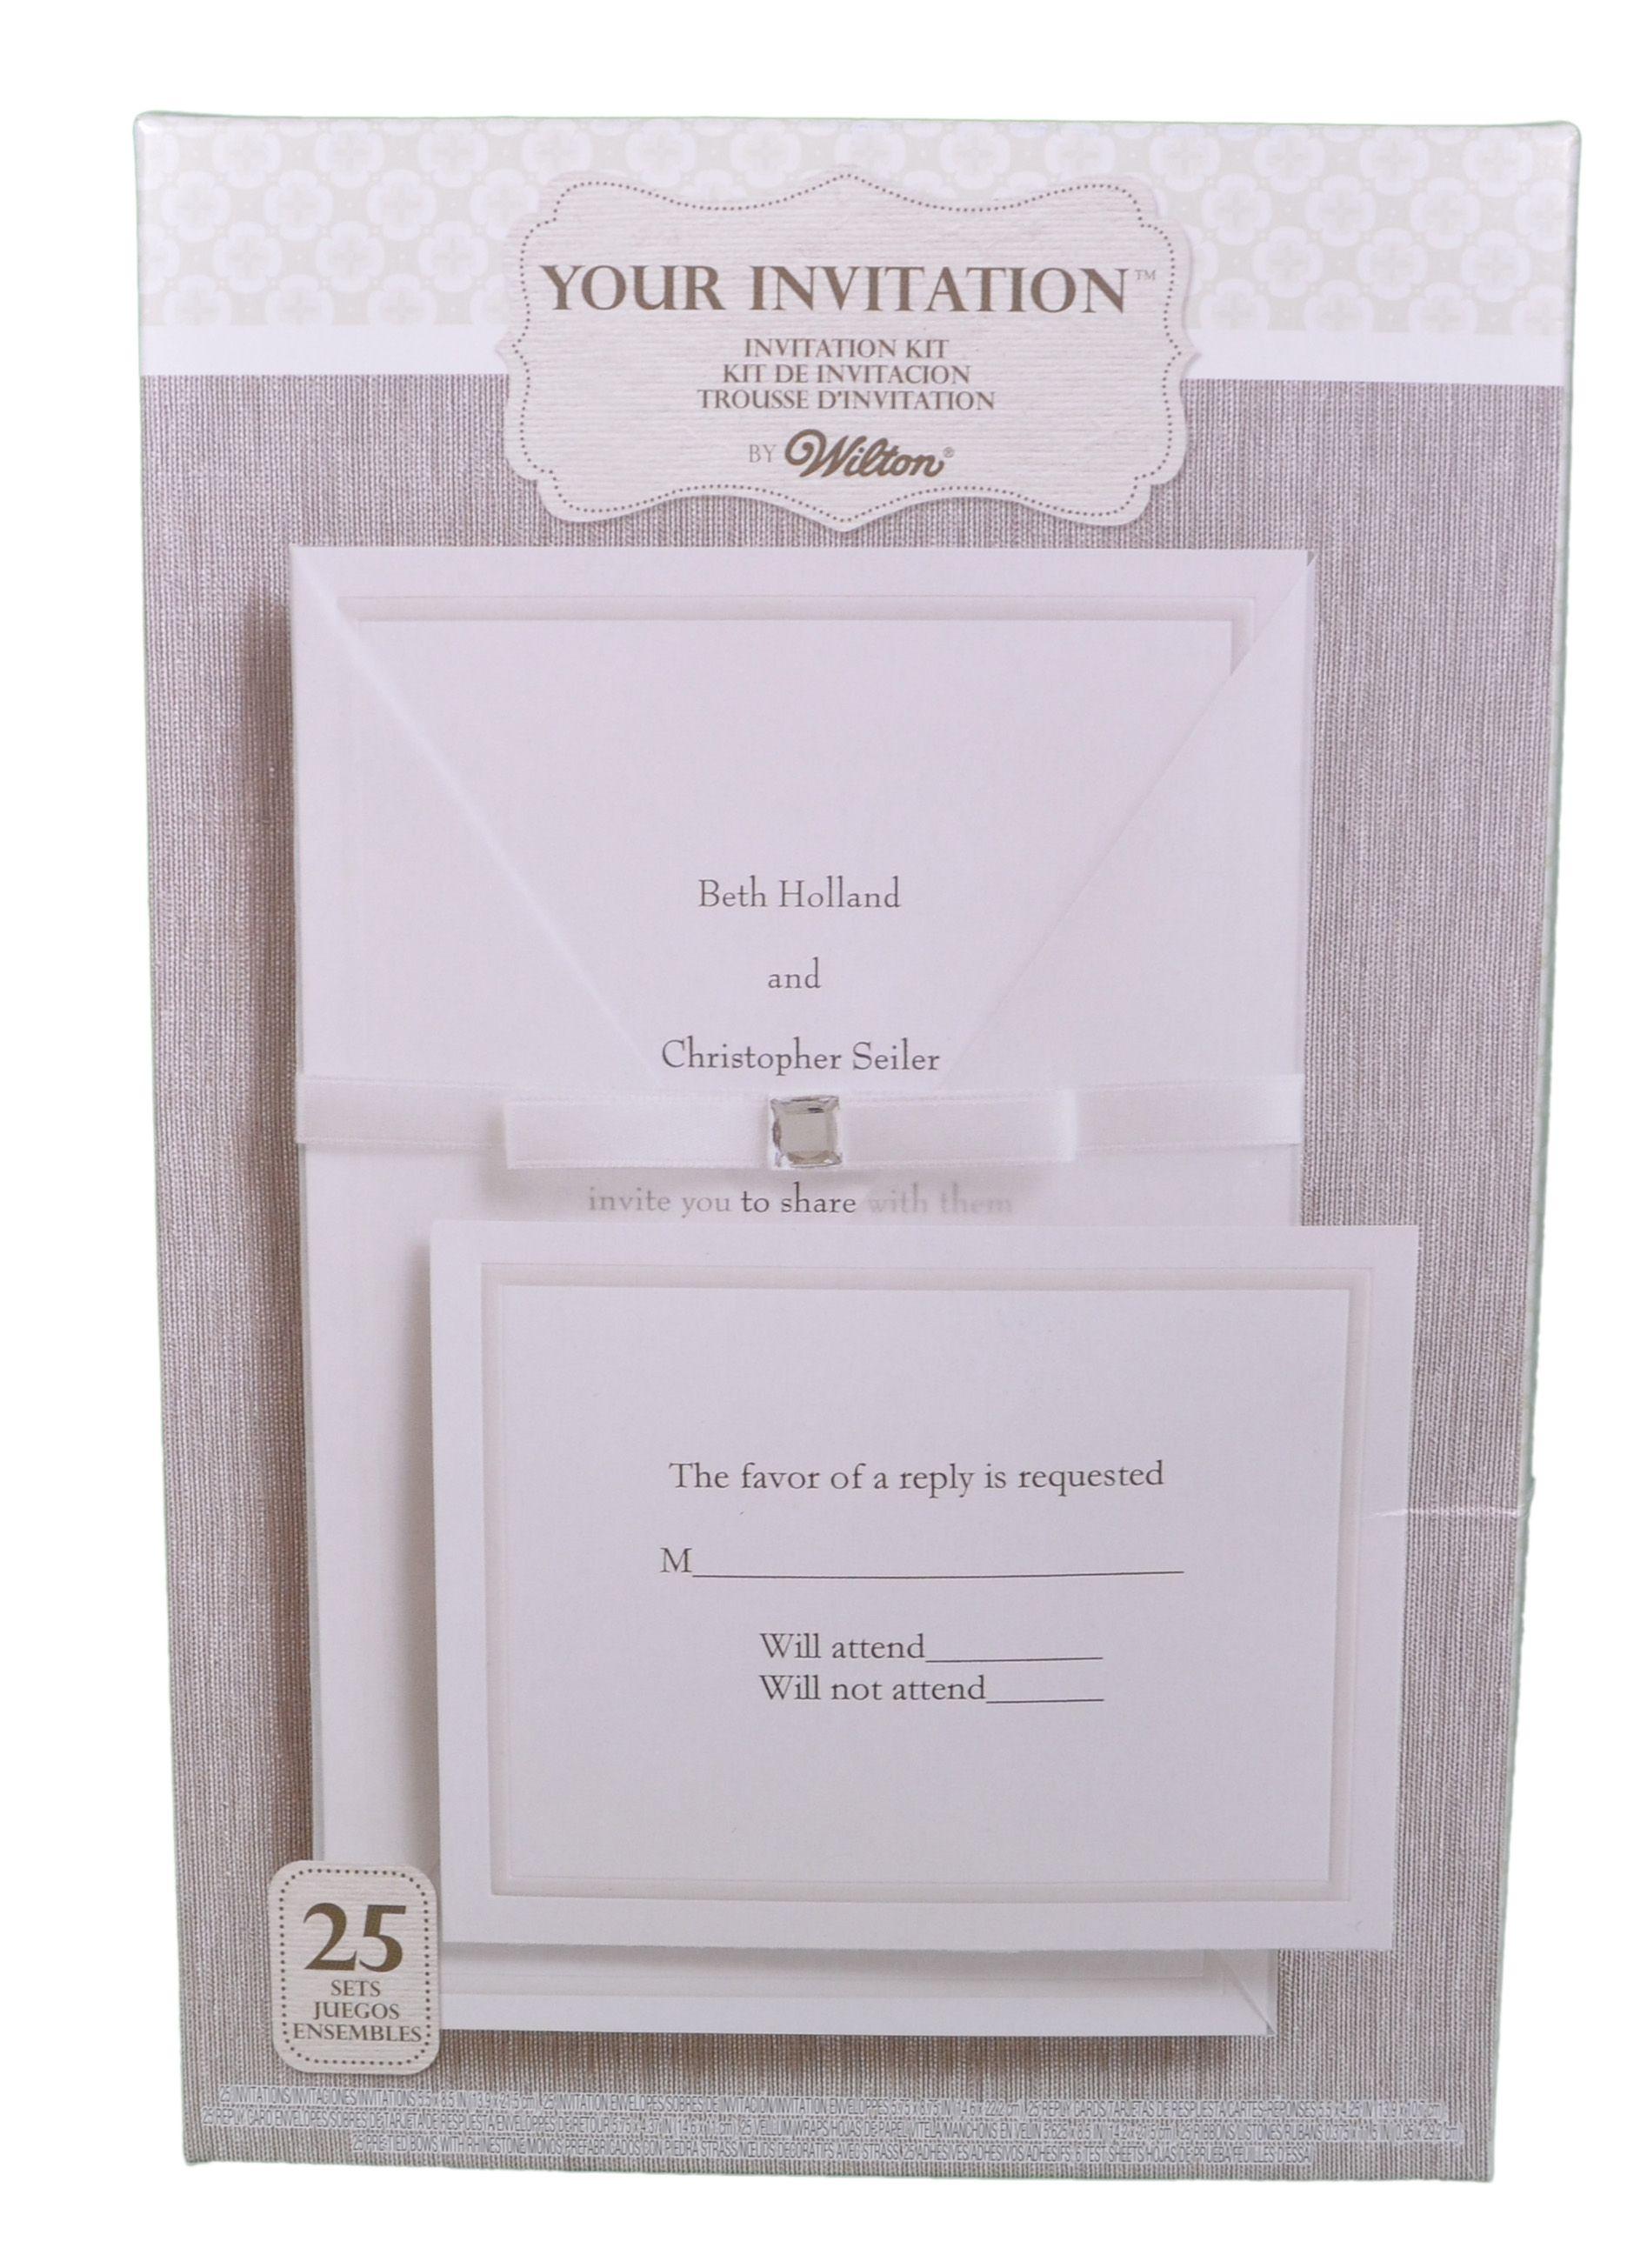 Set Of 25 Wilton Wedding Princess Invitation Kit 1010 107 Print At Home Wedding Invitation Kits Modern Wedding Invitation Wording Fun Wedding Invitations